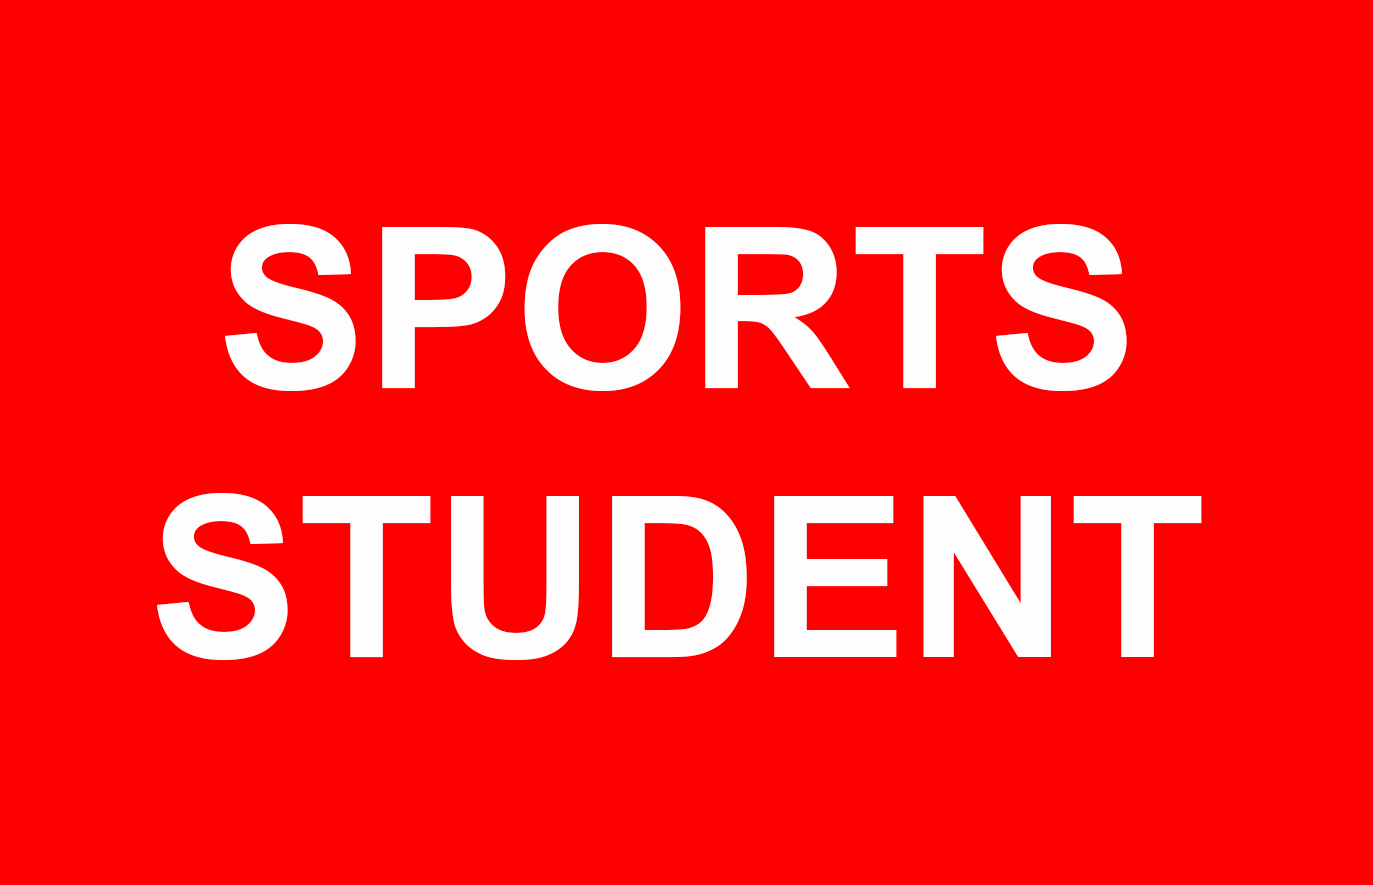 runshaw-sports-student.png